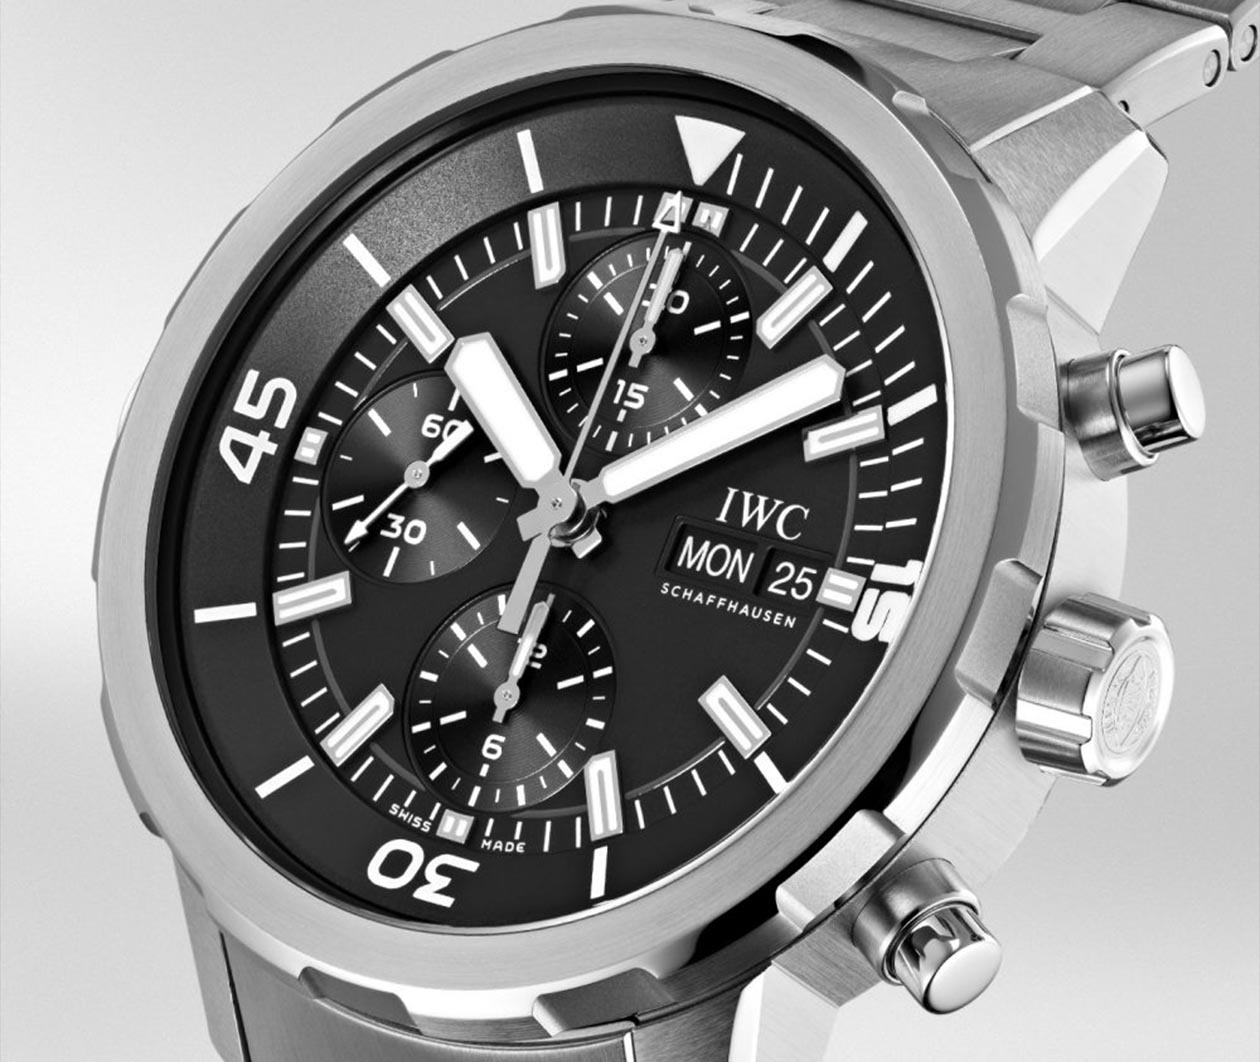 IWC Aquatimer Chronograph IW376804 Carousel 3 FINAL